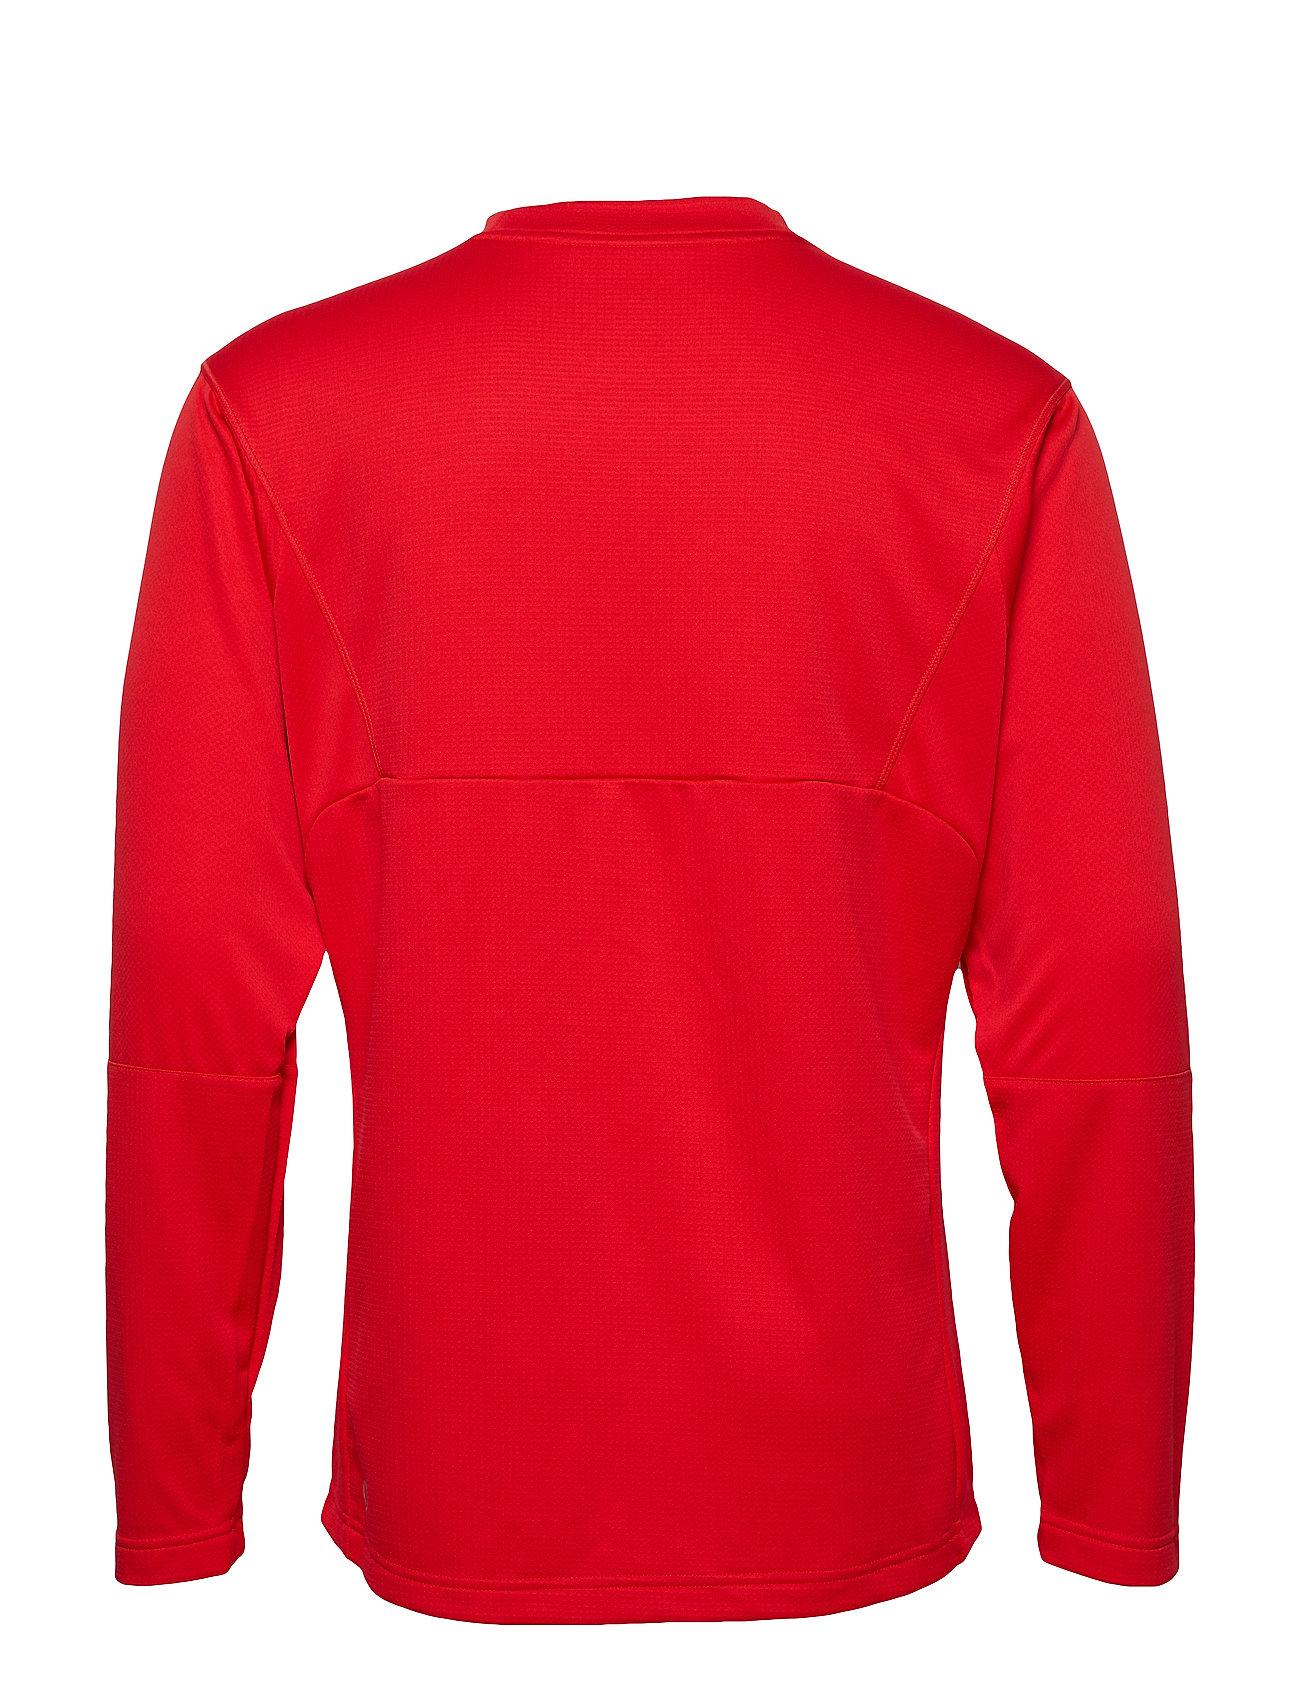 Liga puma WhitePuma Sweatpuma Red Training oreQCxWdB